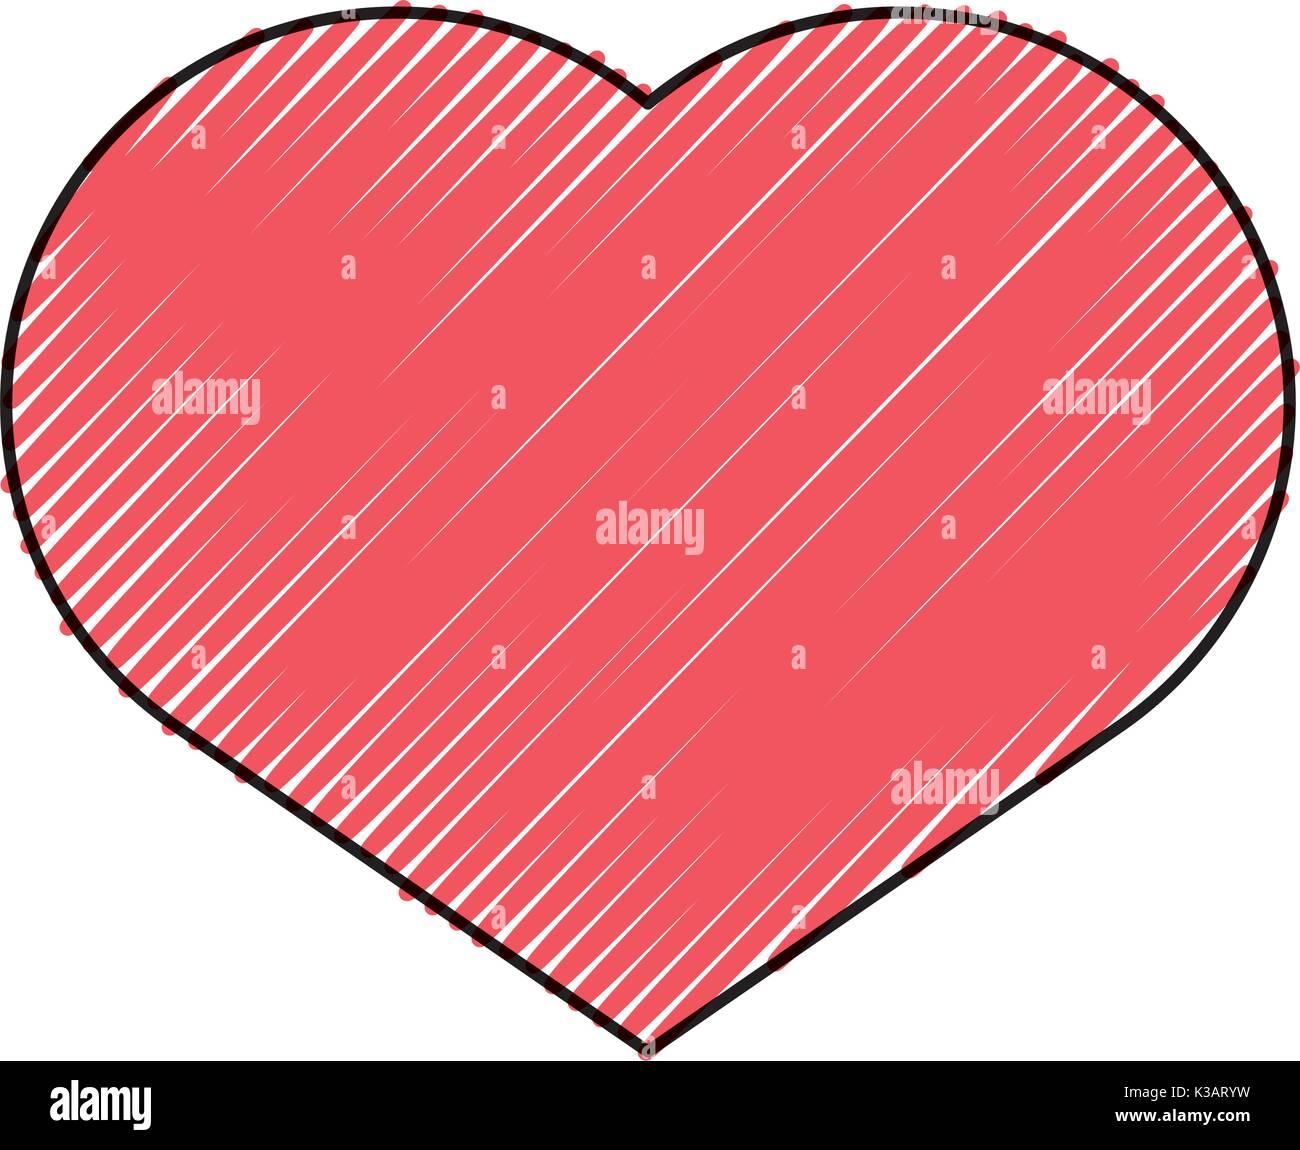 heart shape icon - Stock Image